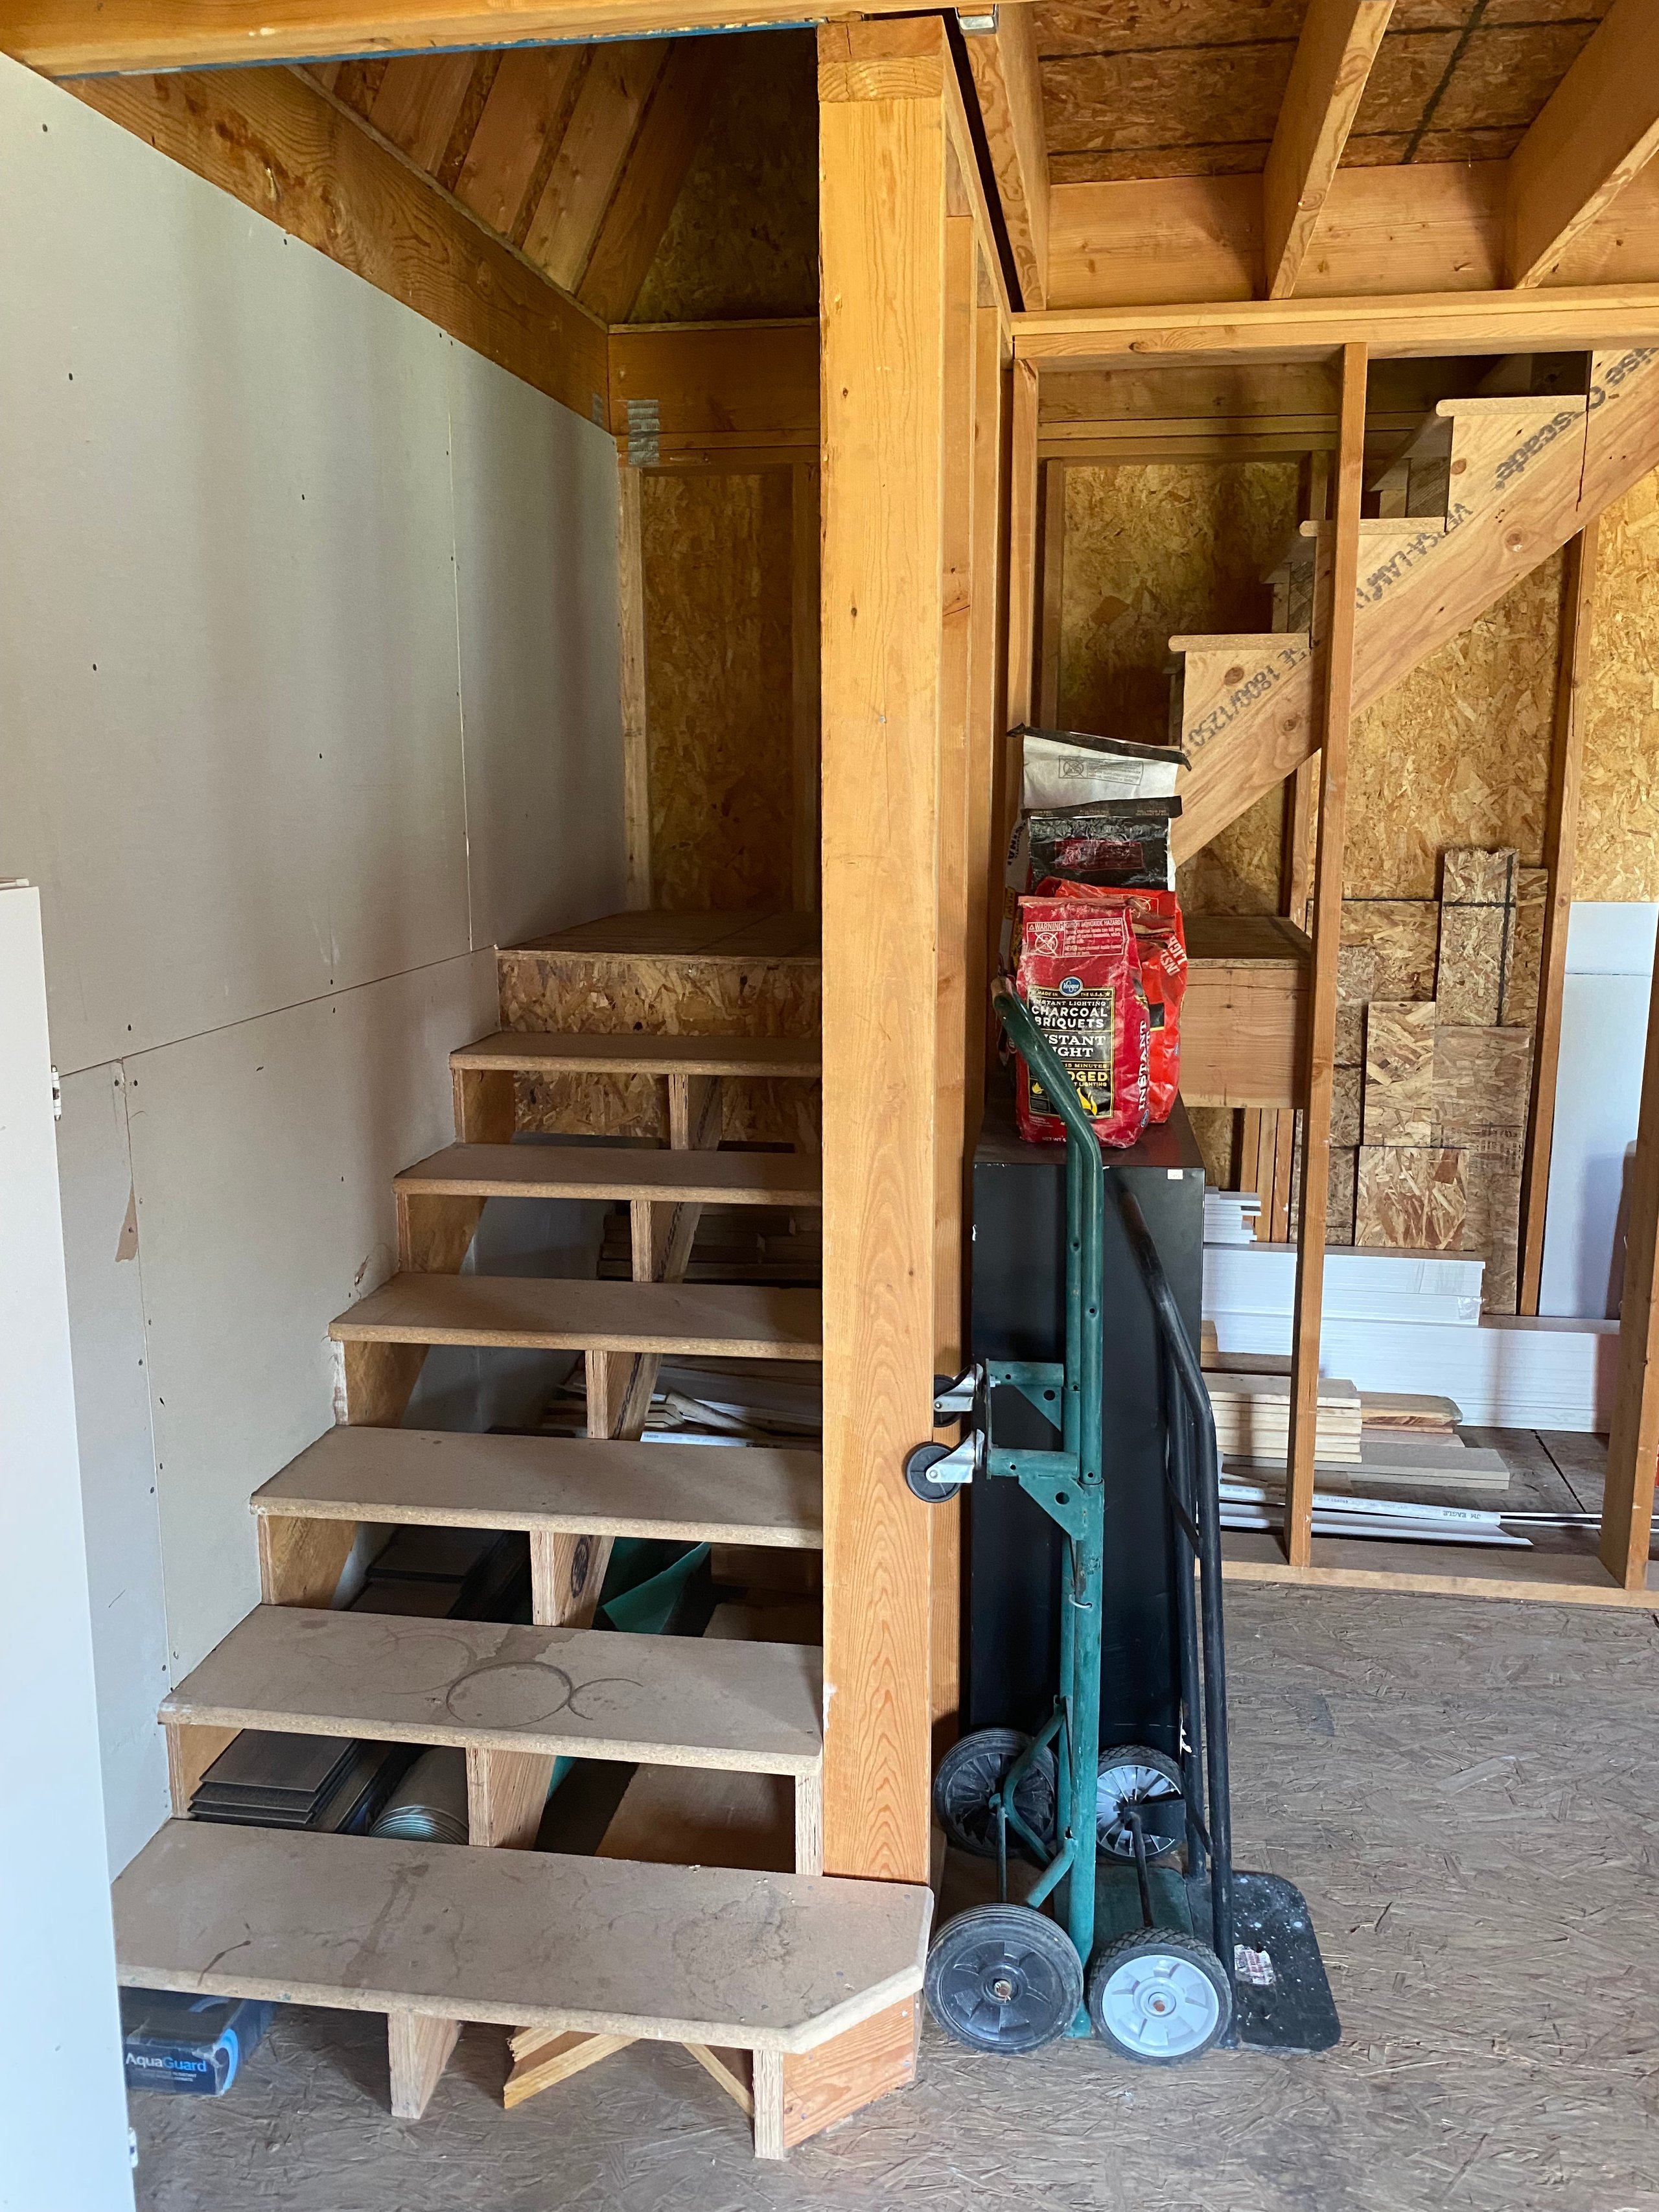 21x16 Shed self storage unit